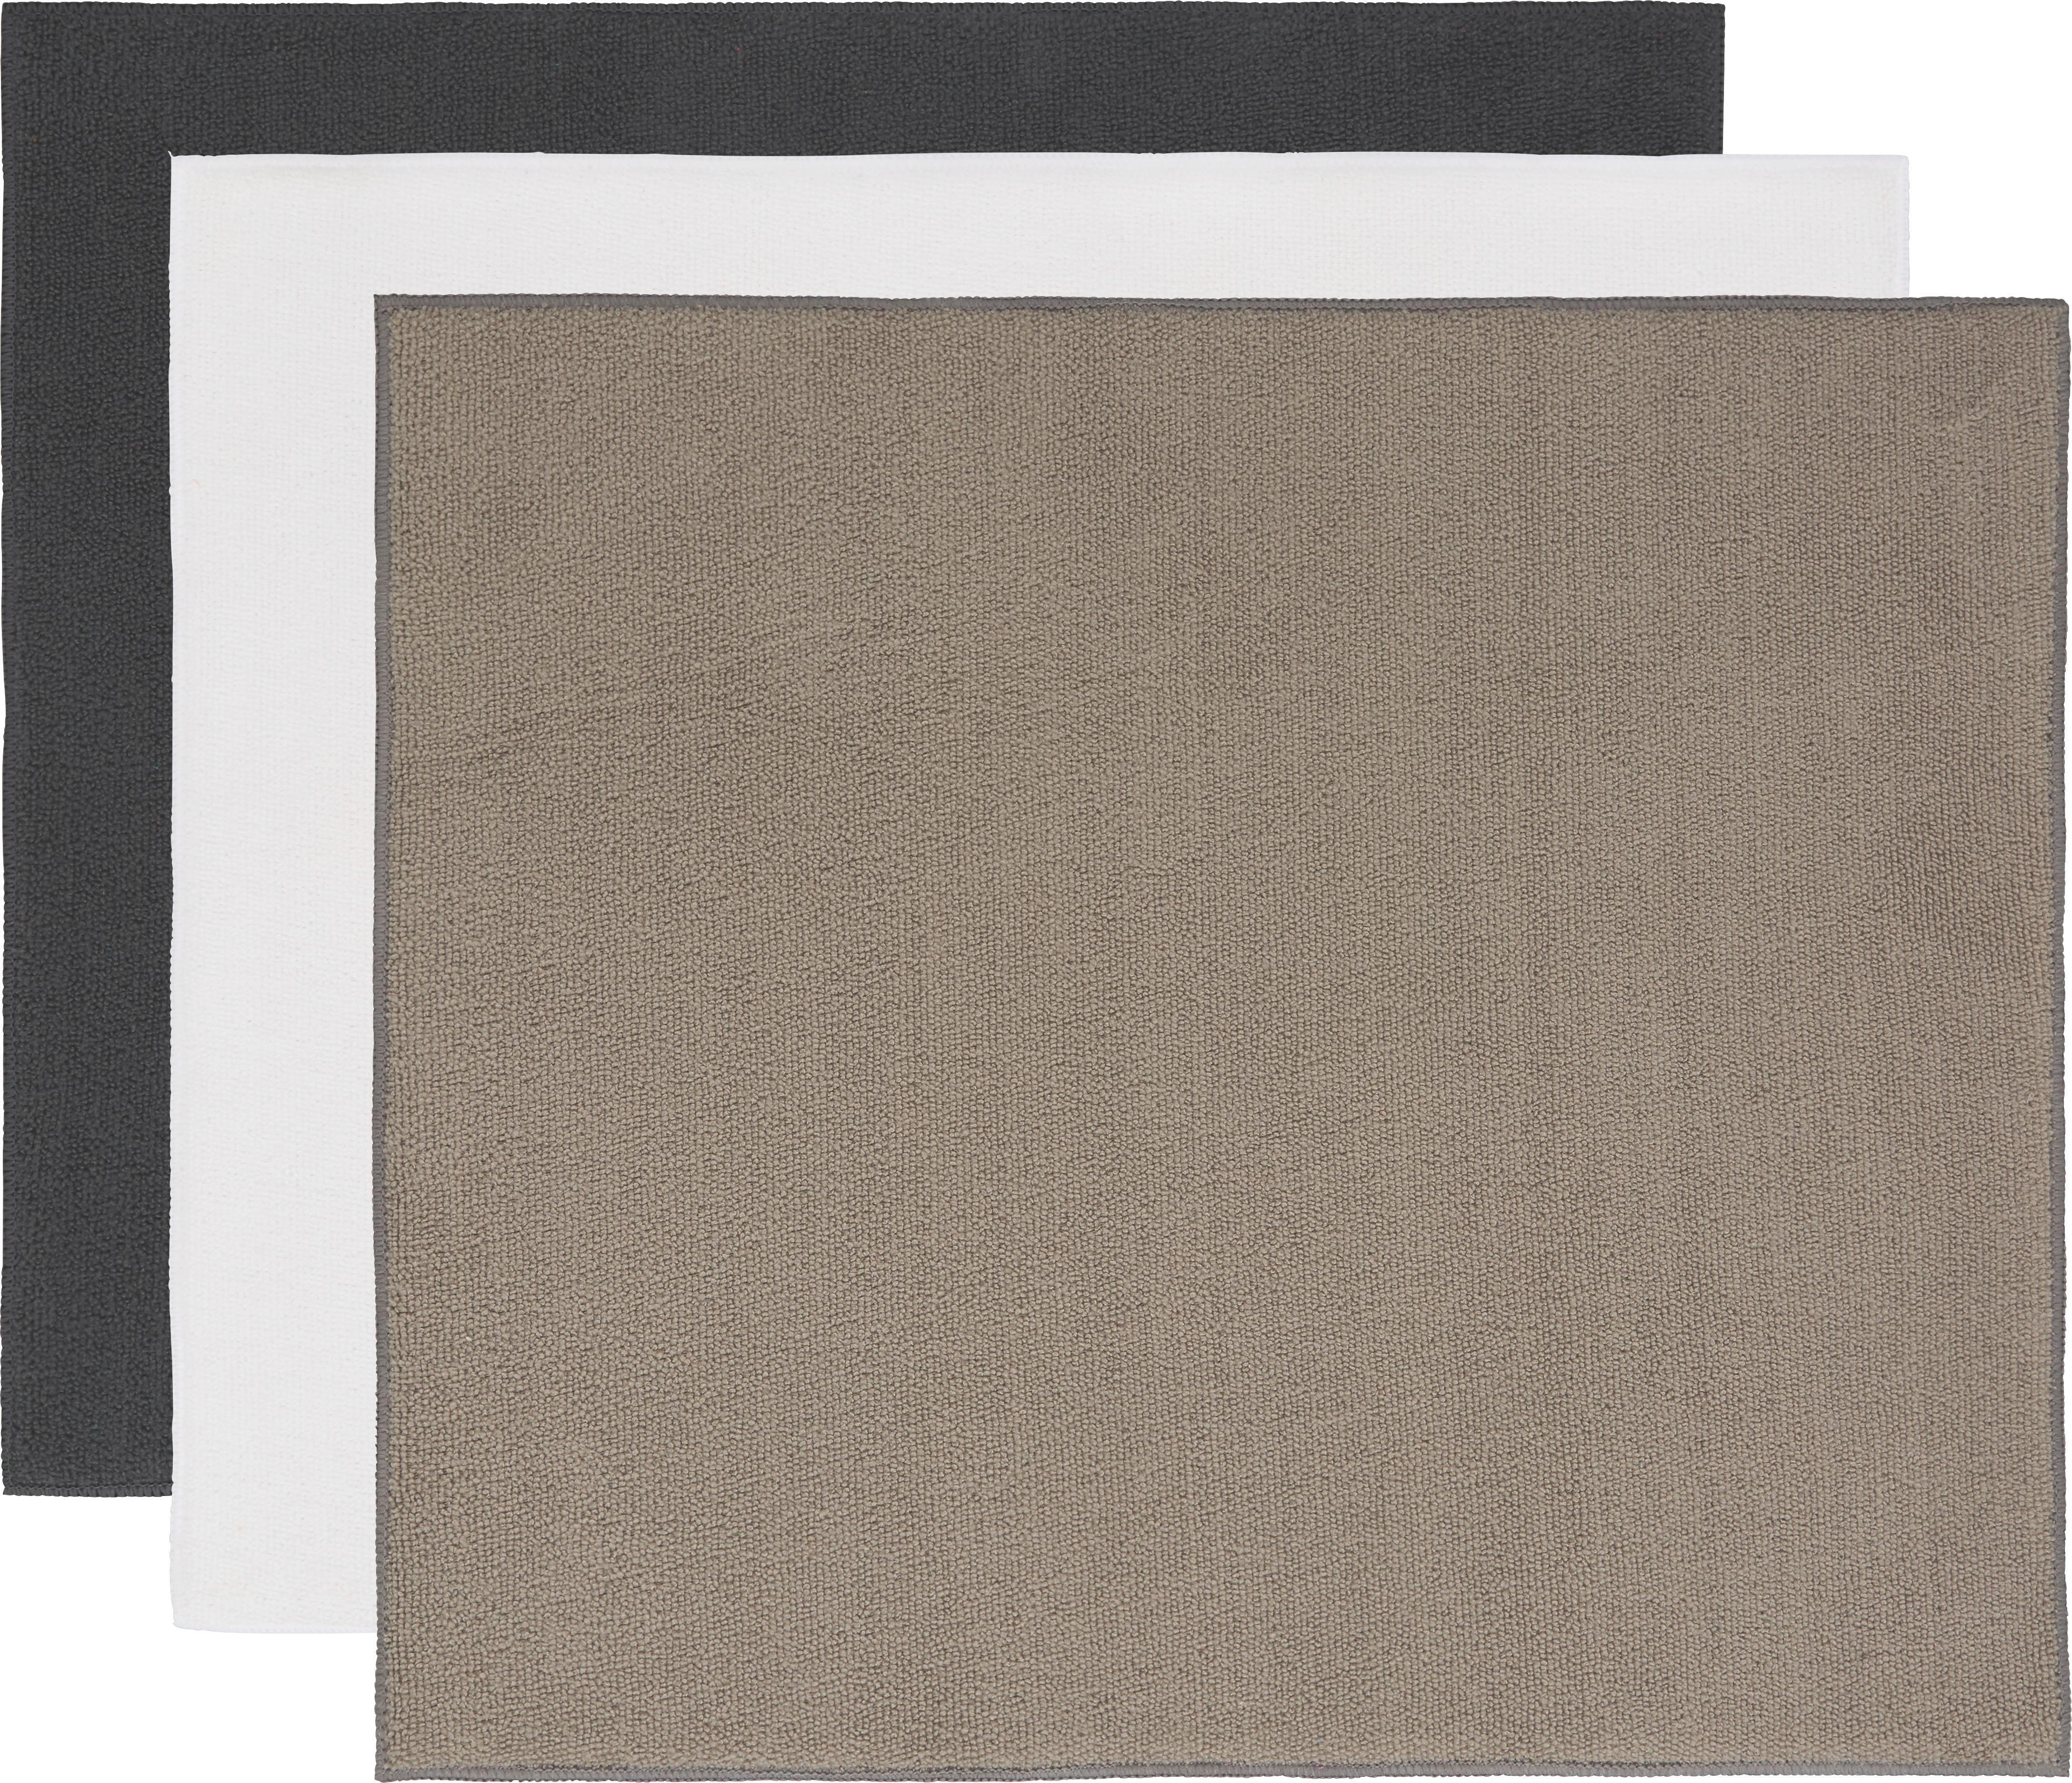 abtropfmatte Marianne - Sandfarben/Anthrazit, Textil (40/45cm) - MÖMAX modern living